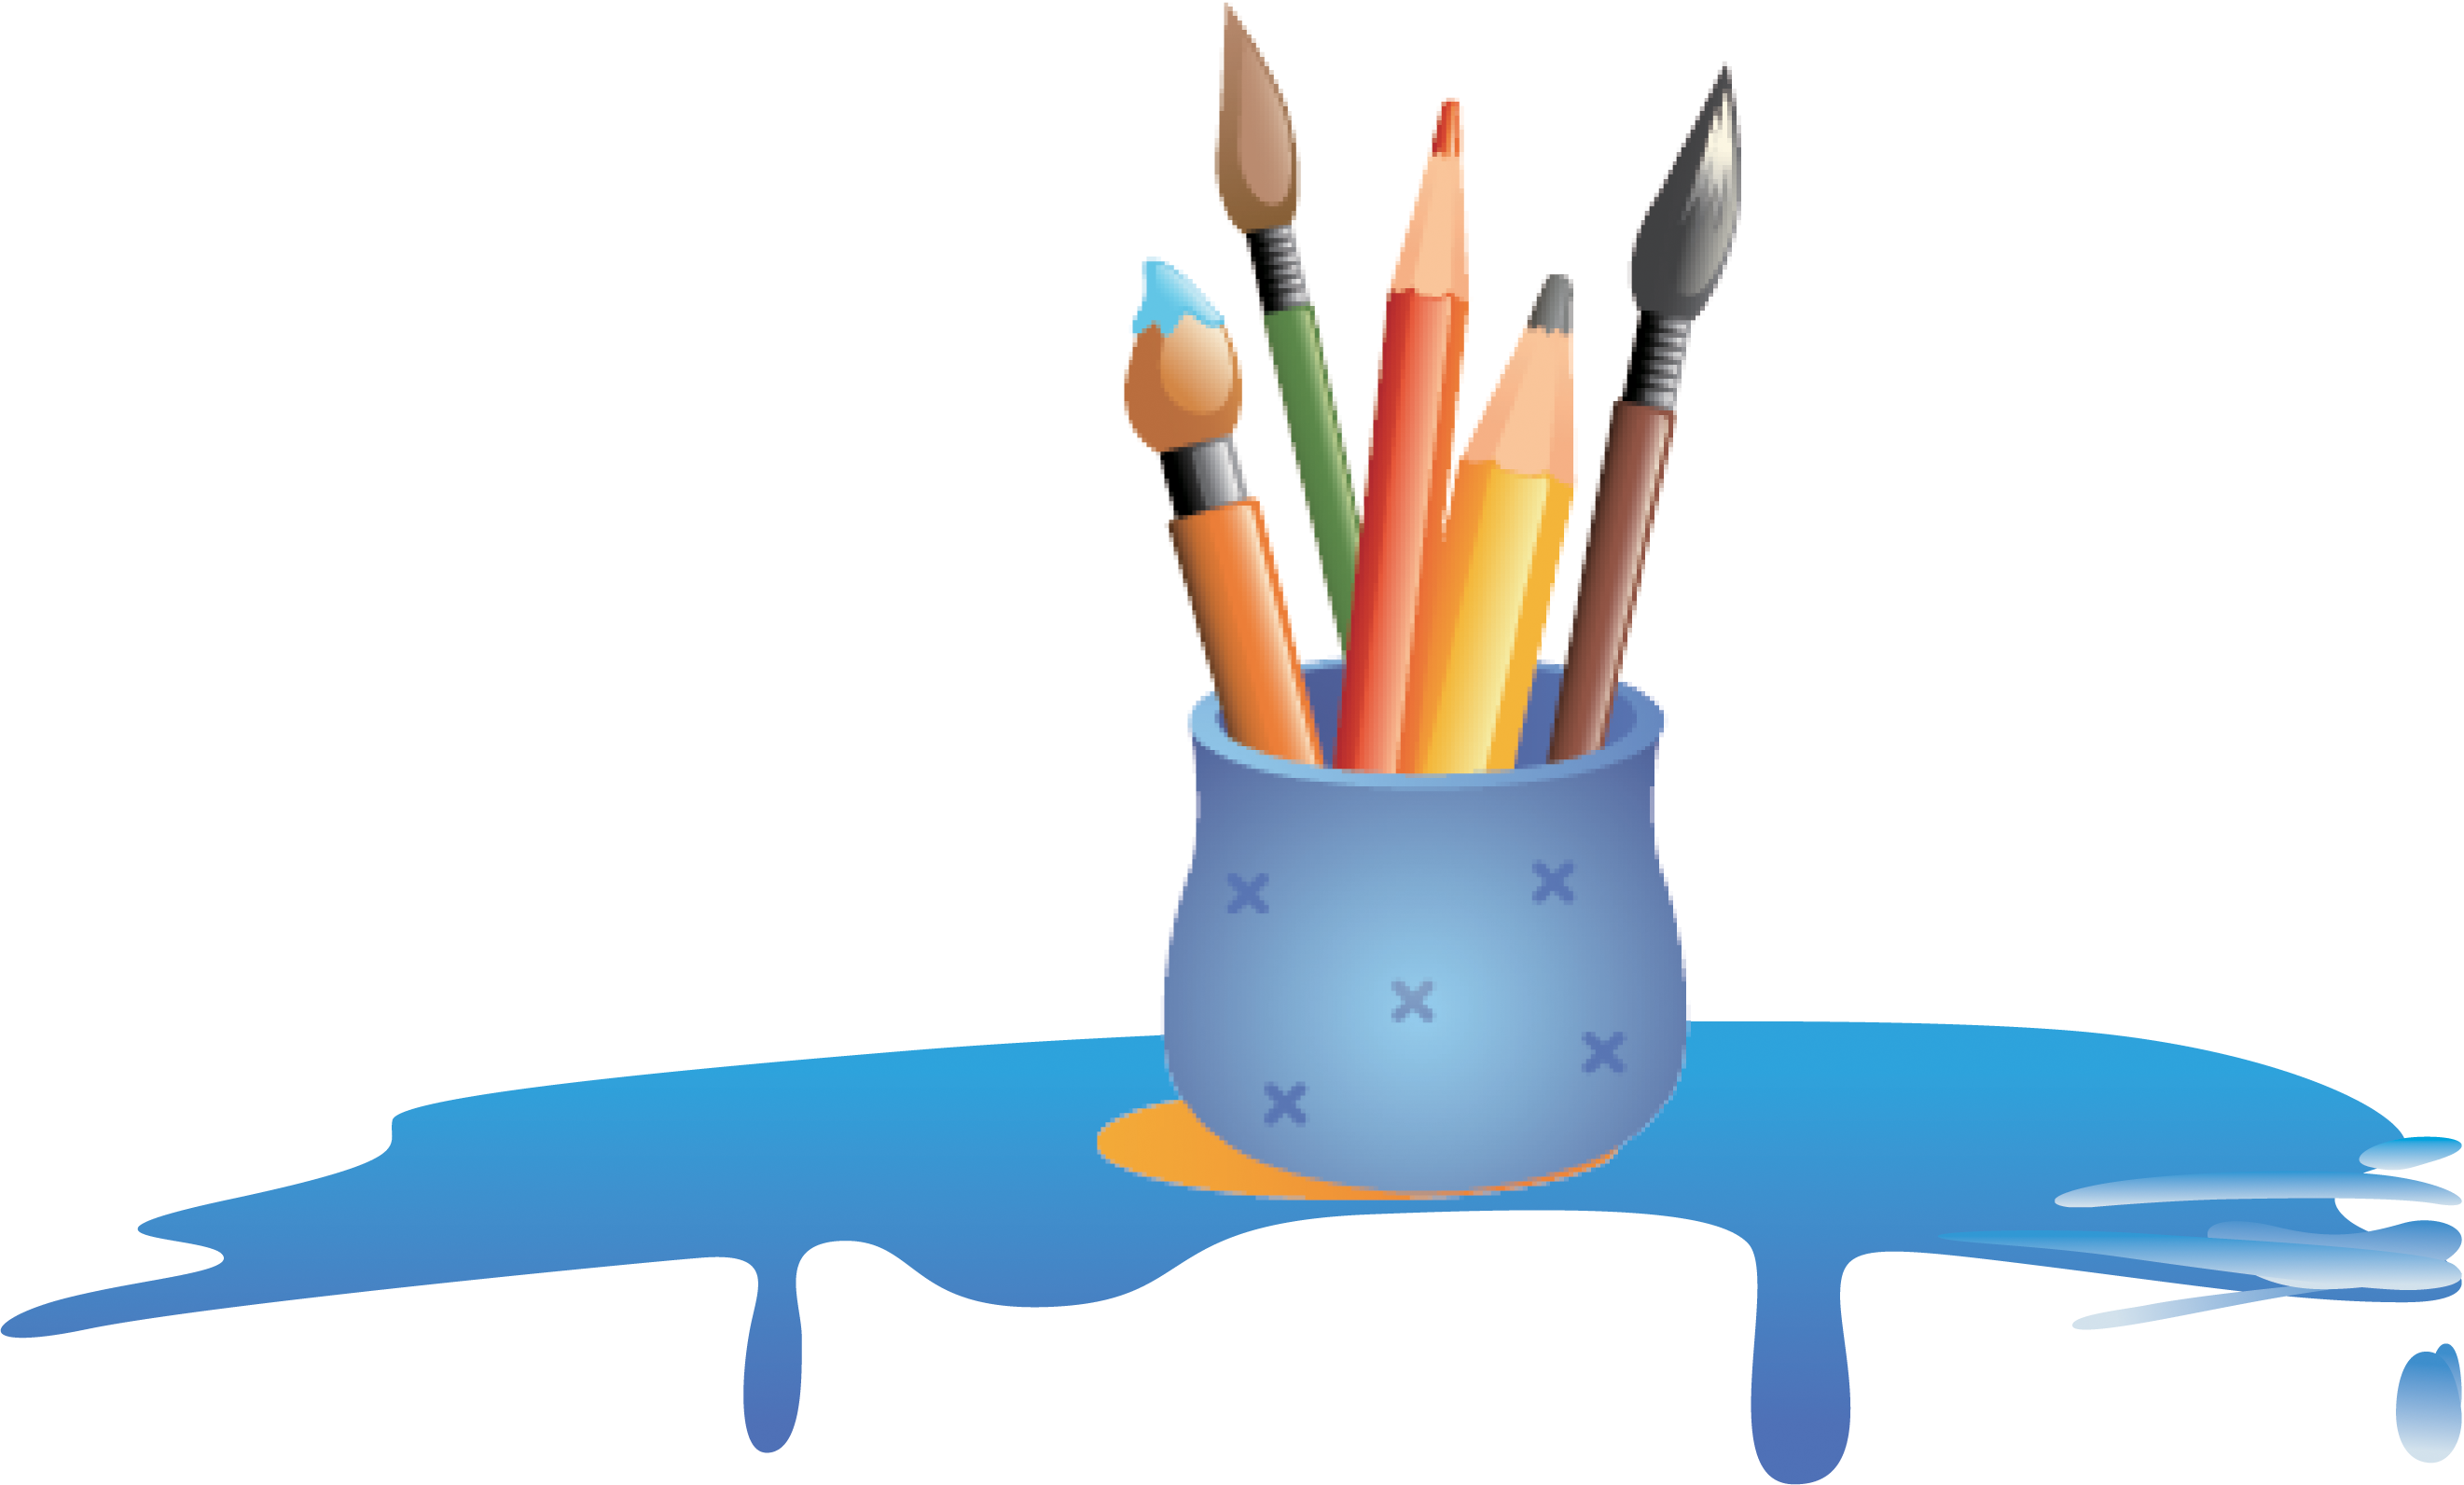 Paintbrush clipart colored pencil. Painting cartoon pen transprent